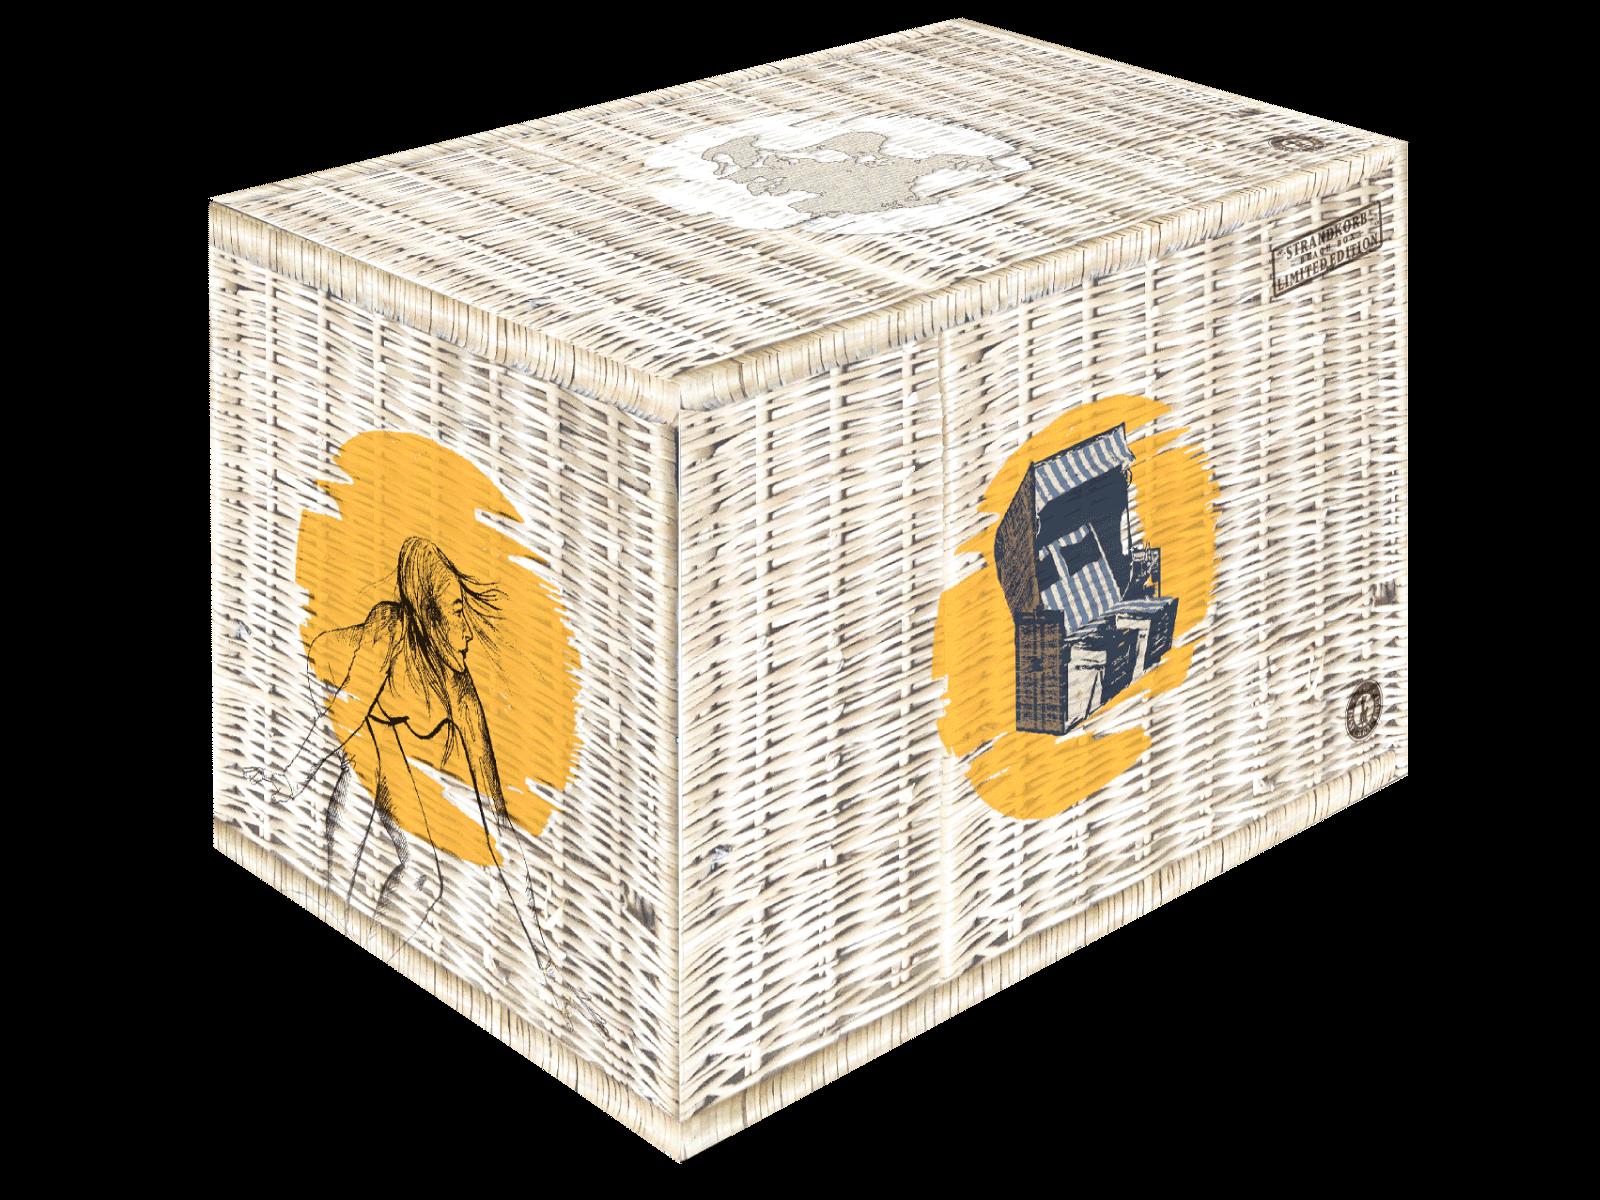 STRAND BOX